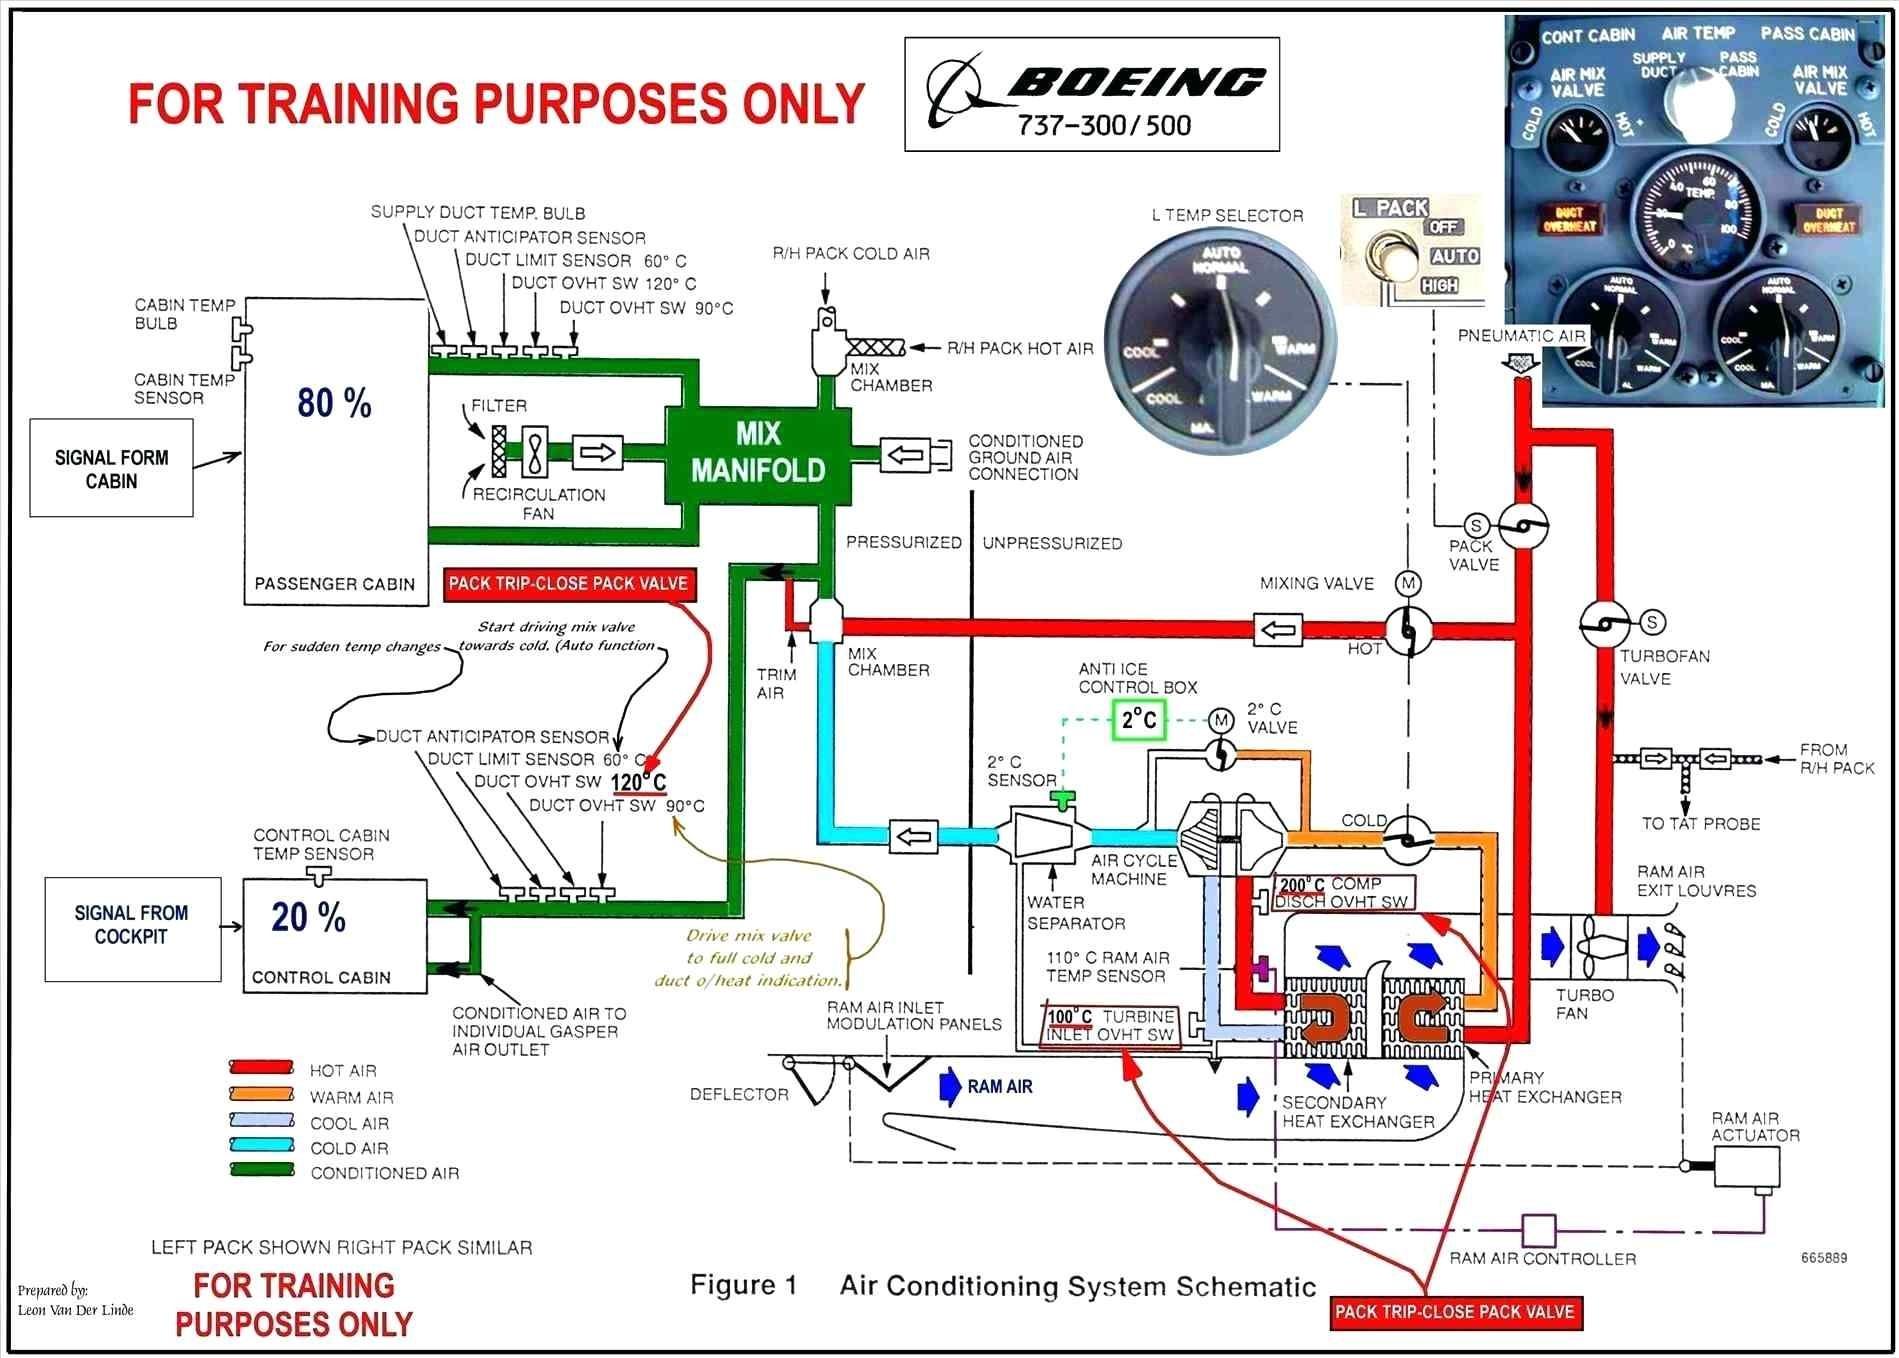 auto air diagram example electrical wiring diagram u2022 rh cranejapan co car ac wiring diagram car ac wiring diagram